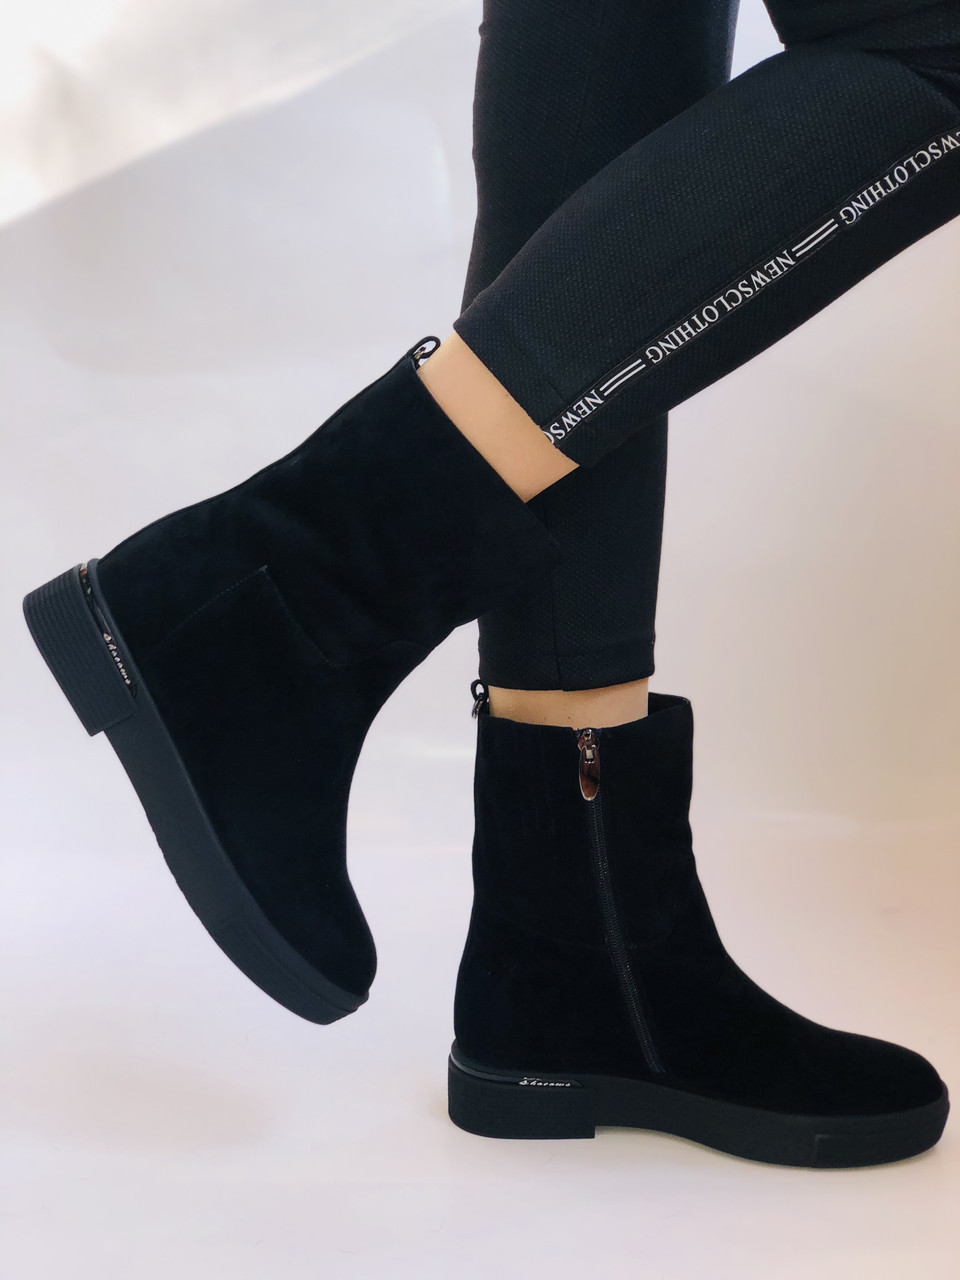 Polann, Зимние ботинки на натуральном меху. Р.36, 38